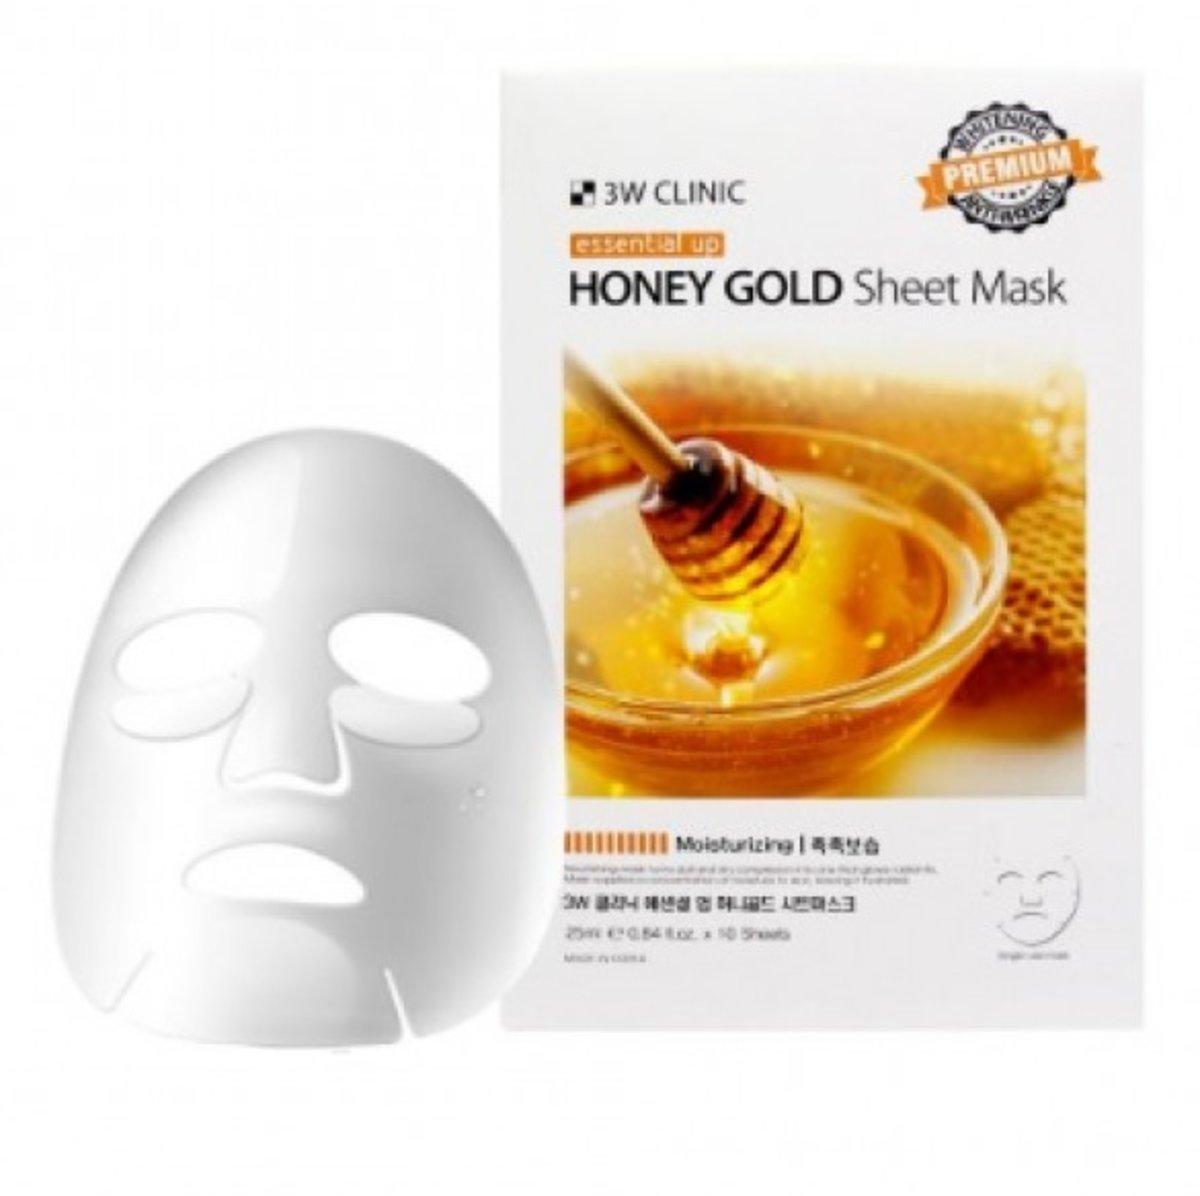 Essential Up Sheet Mask -HONEY GOLD (10pcs)